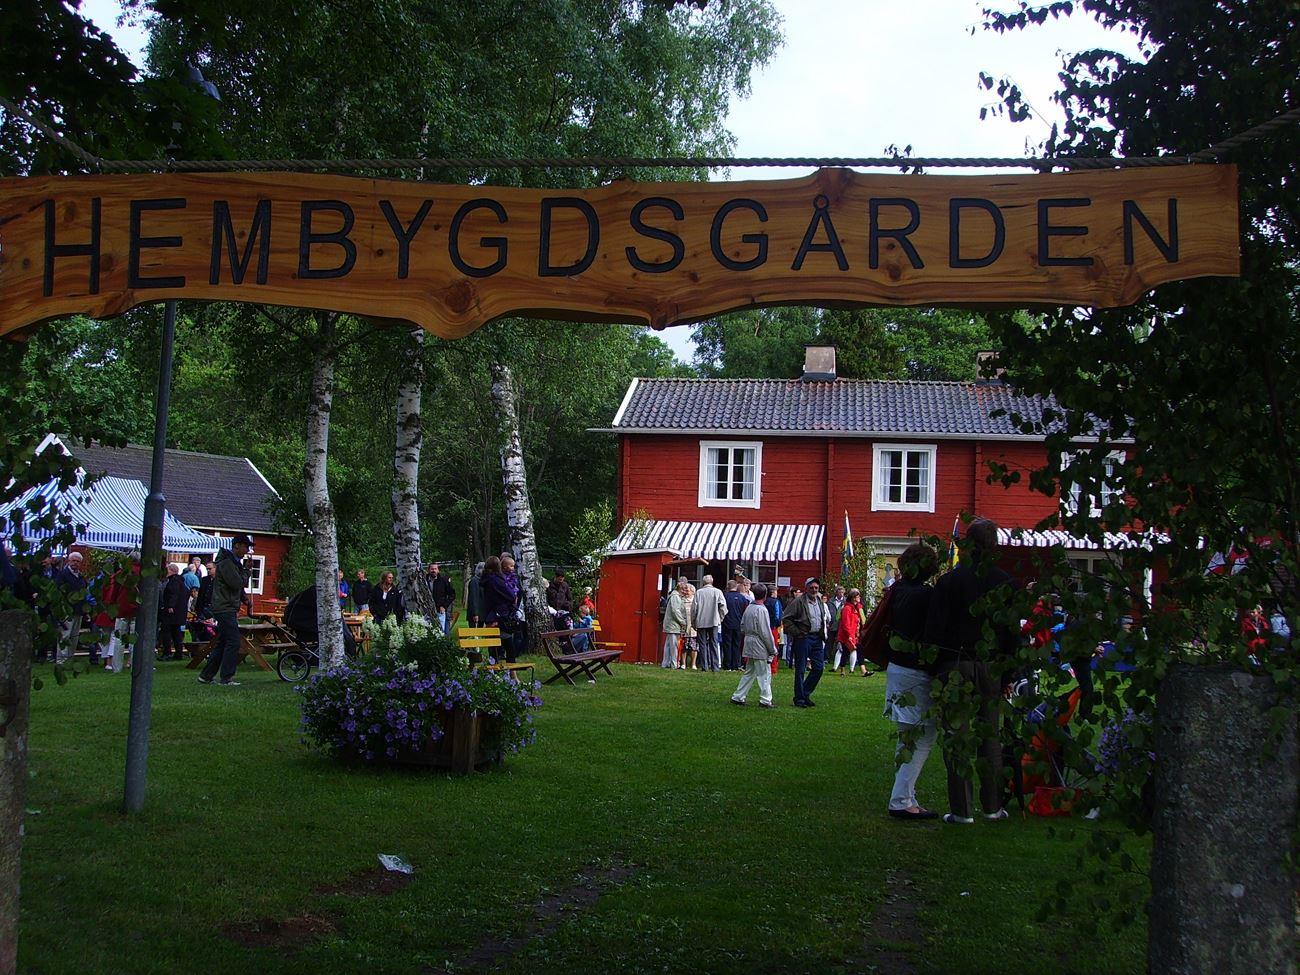 © Skede Hembygsgård, Skede Hembygdsgård